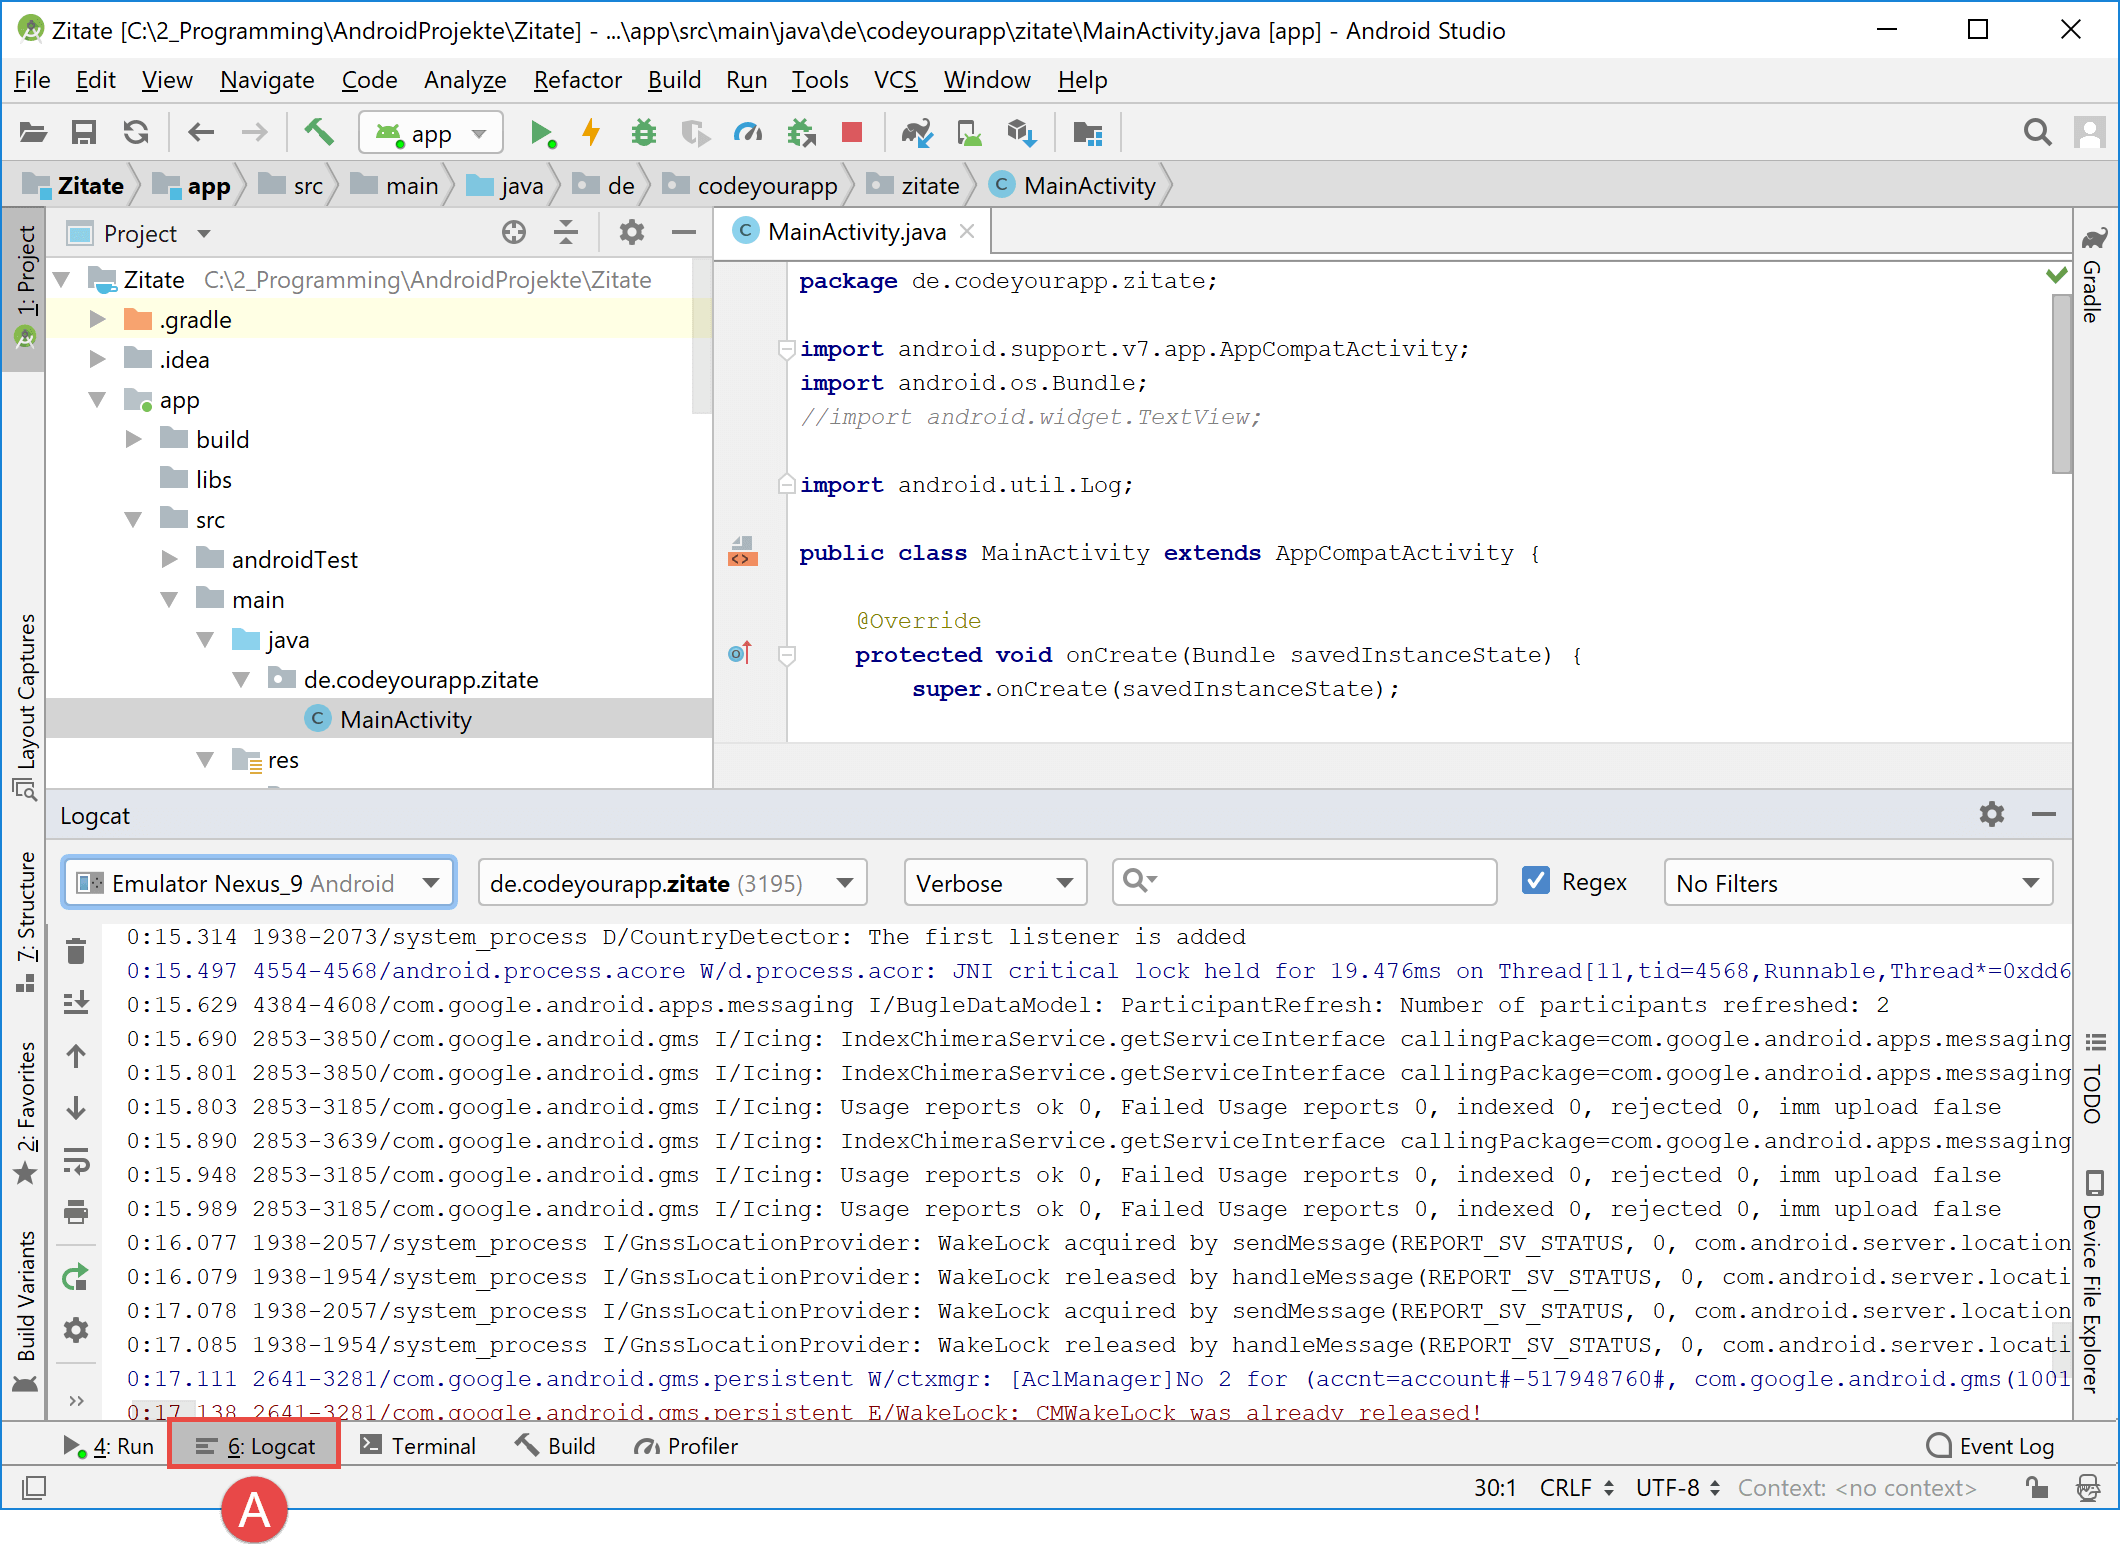 logcat_tool_window_open